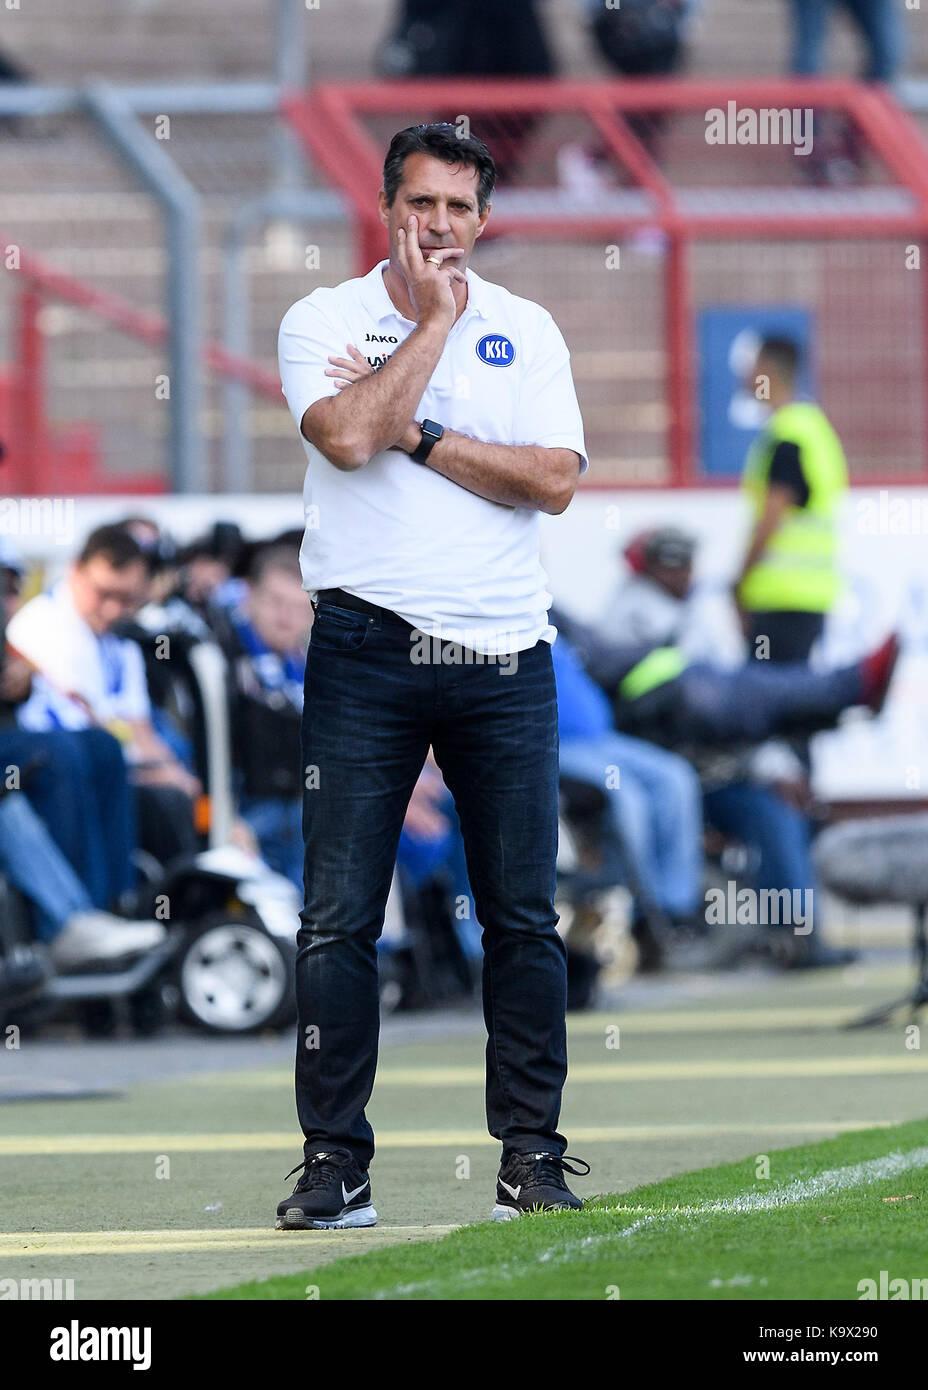 Karlsruhe, Deutschland. 24th Sep, 2017. Trainer Alois Schwartz (KSC). GES/ Fussball/ 3. Liga: Karlsruher SC - FC - Stock Image